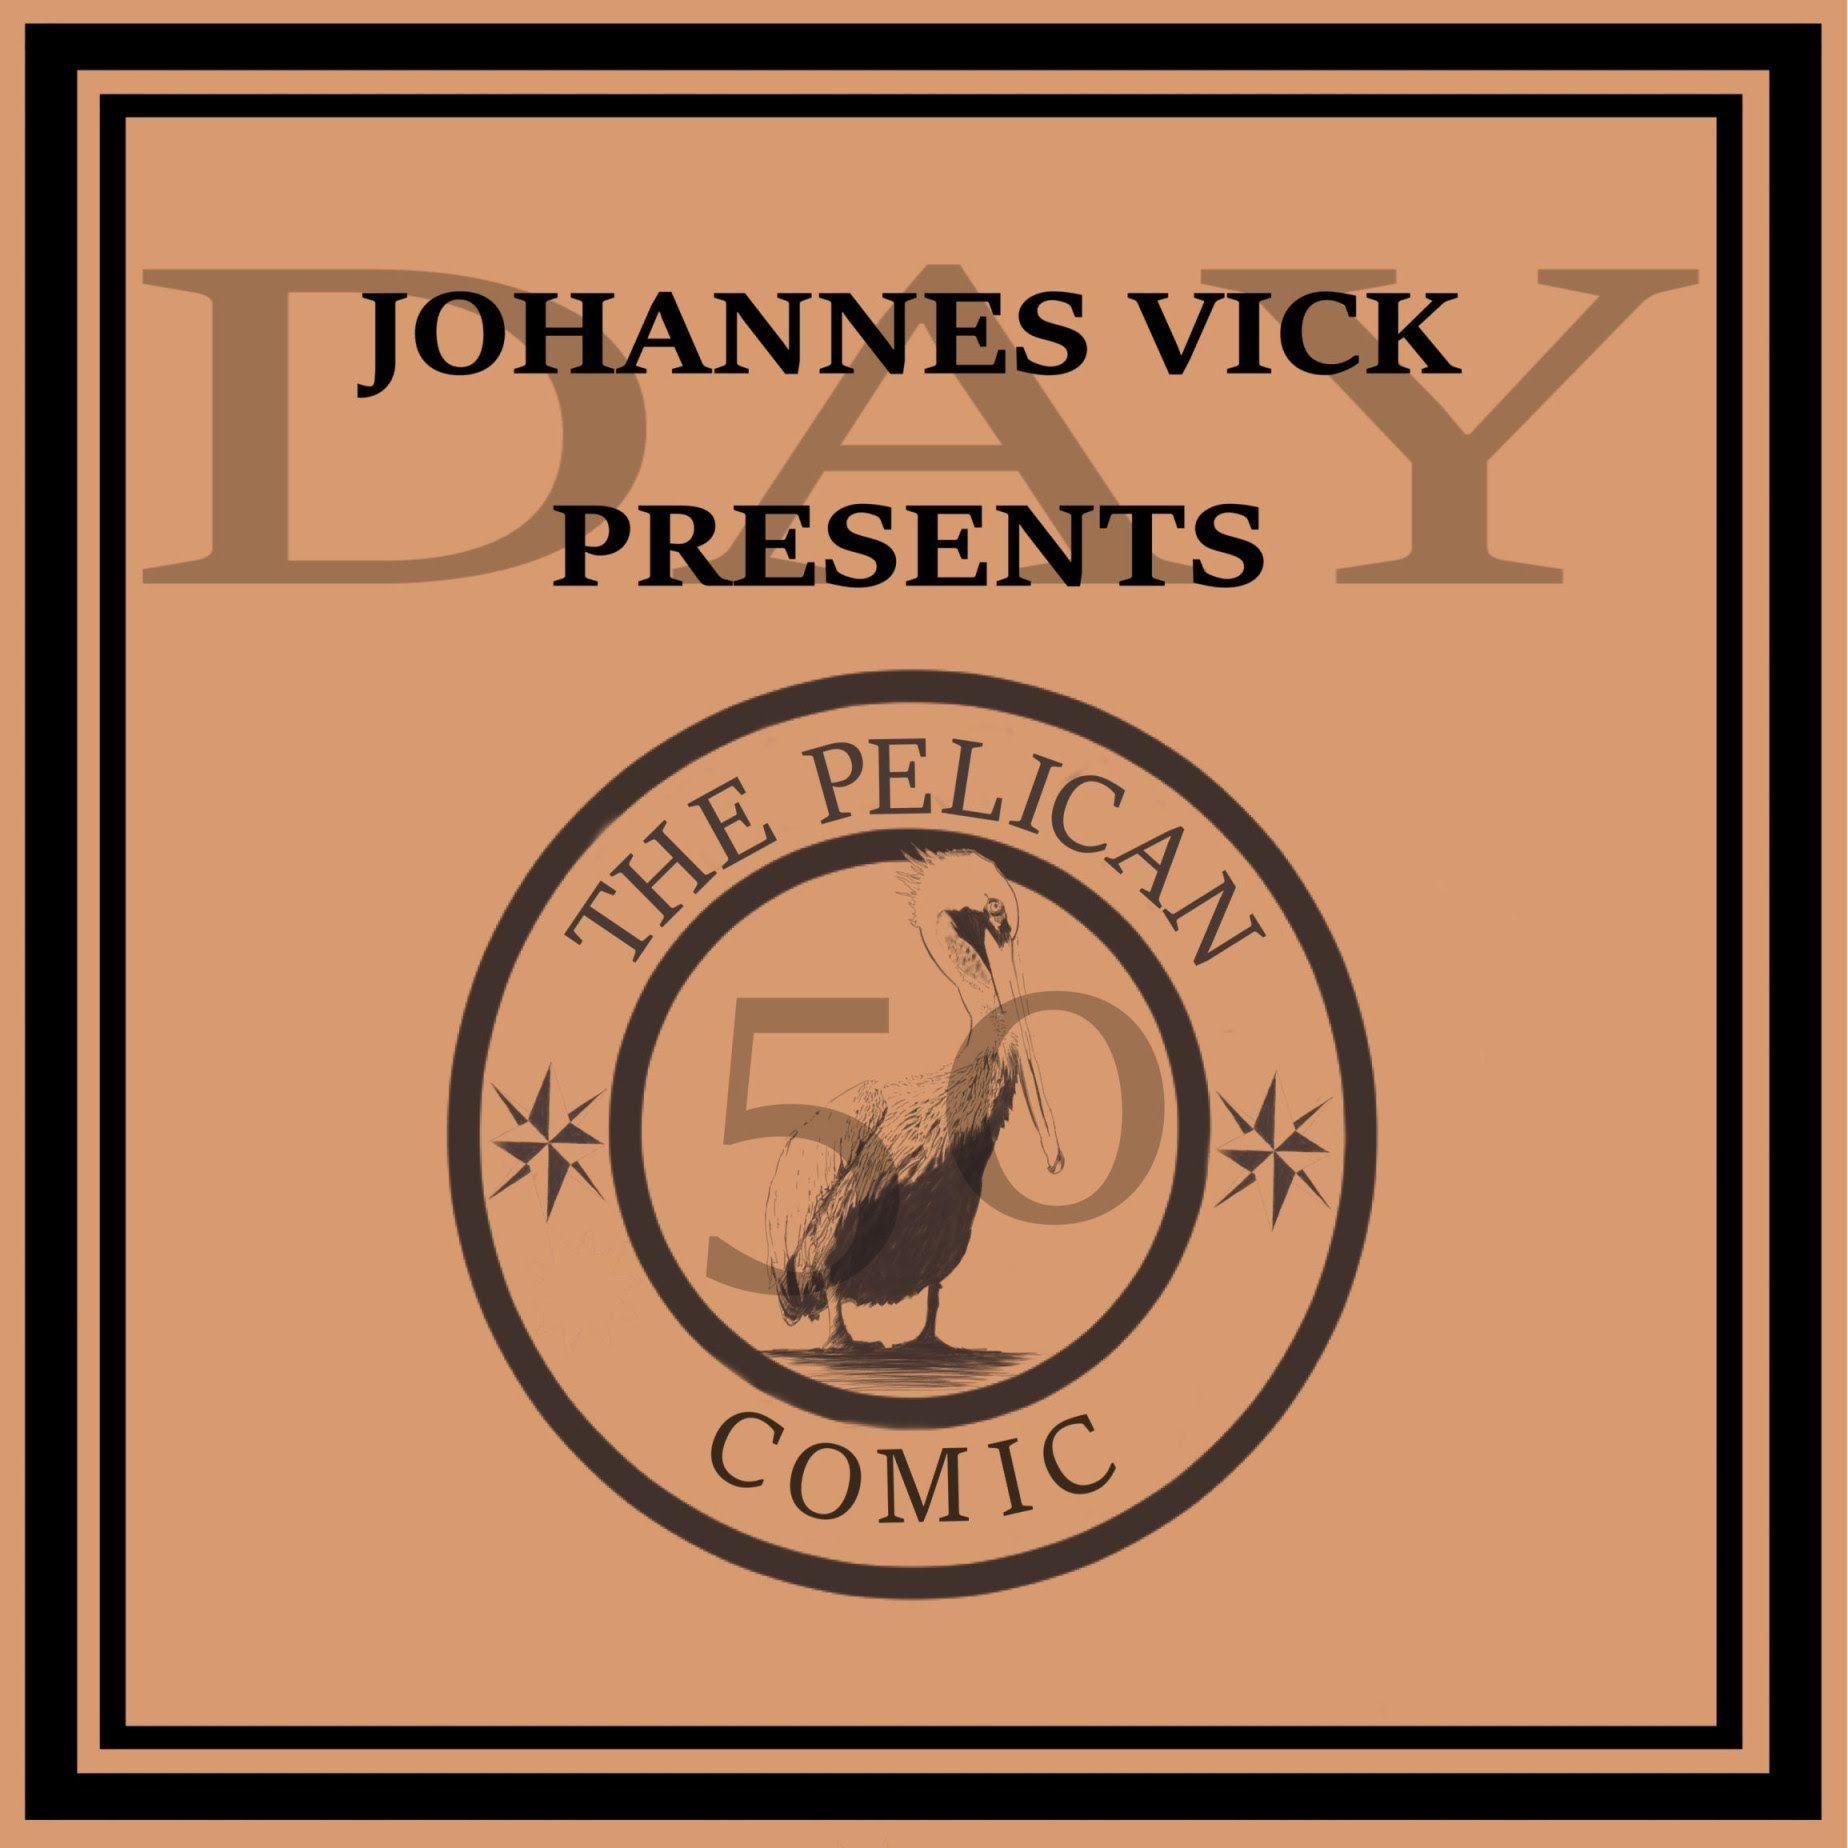 100 Days of Making Comics day 50